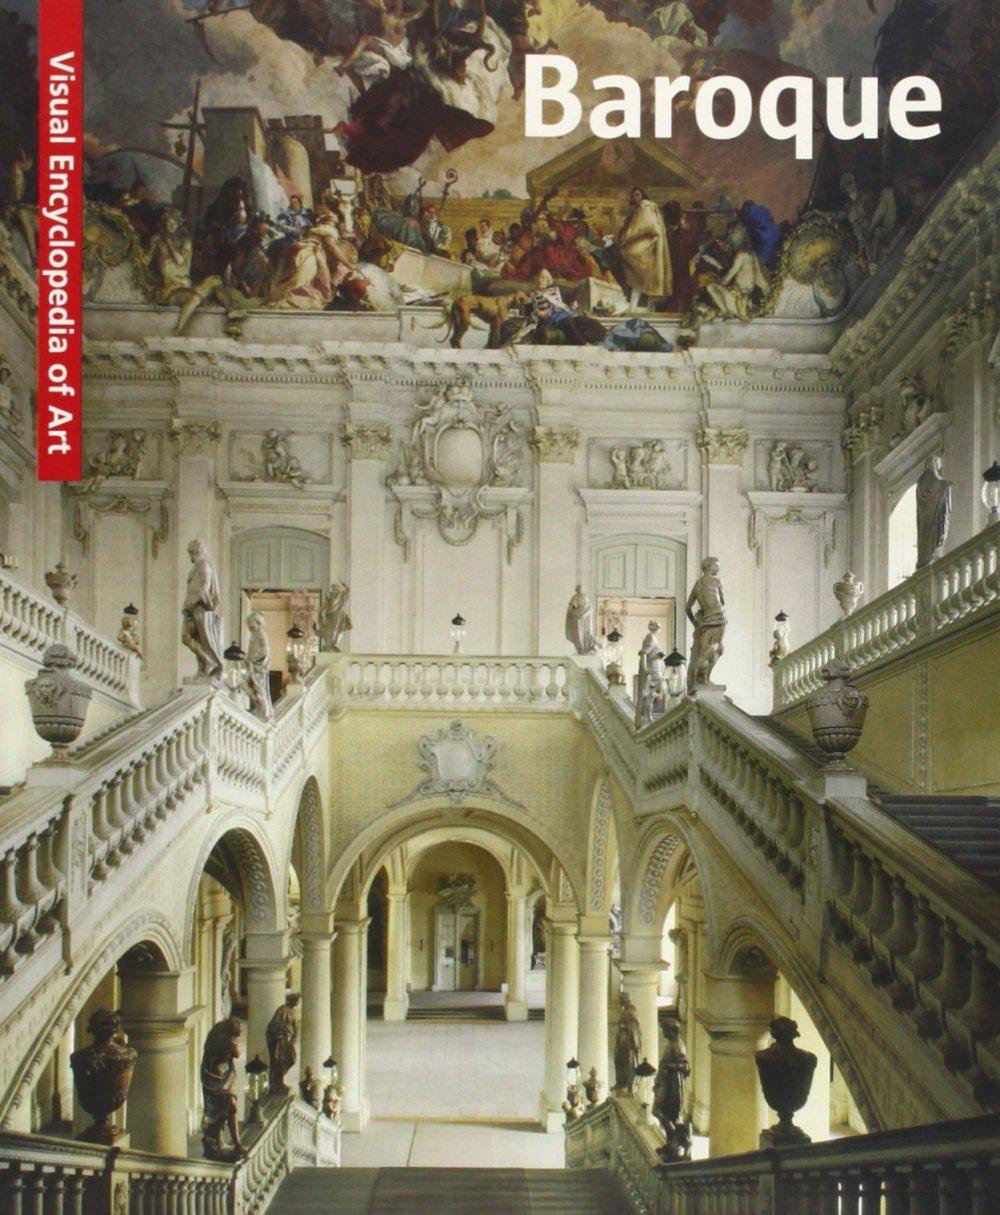 Baroque: The Visual Encyclopedia of Art